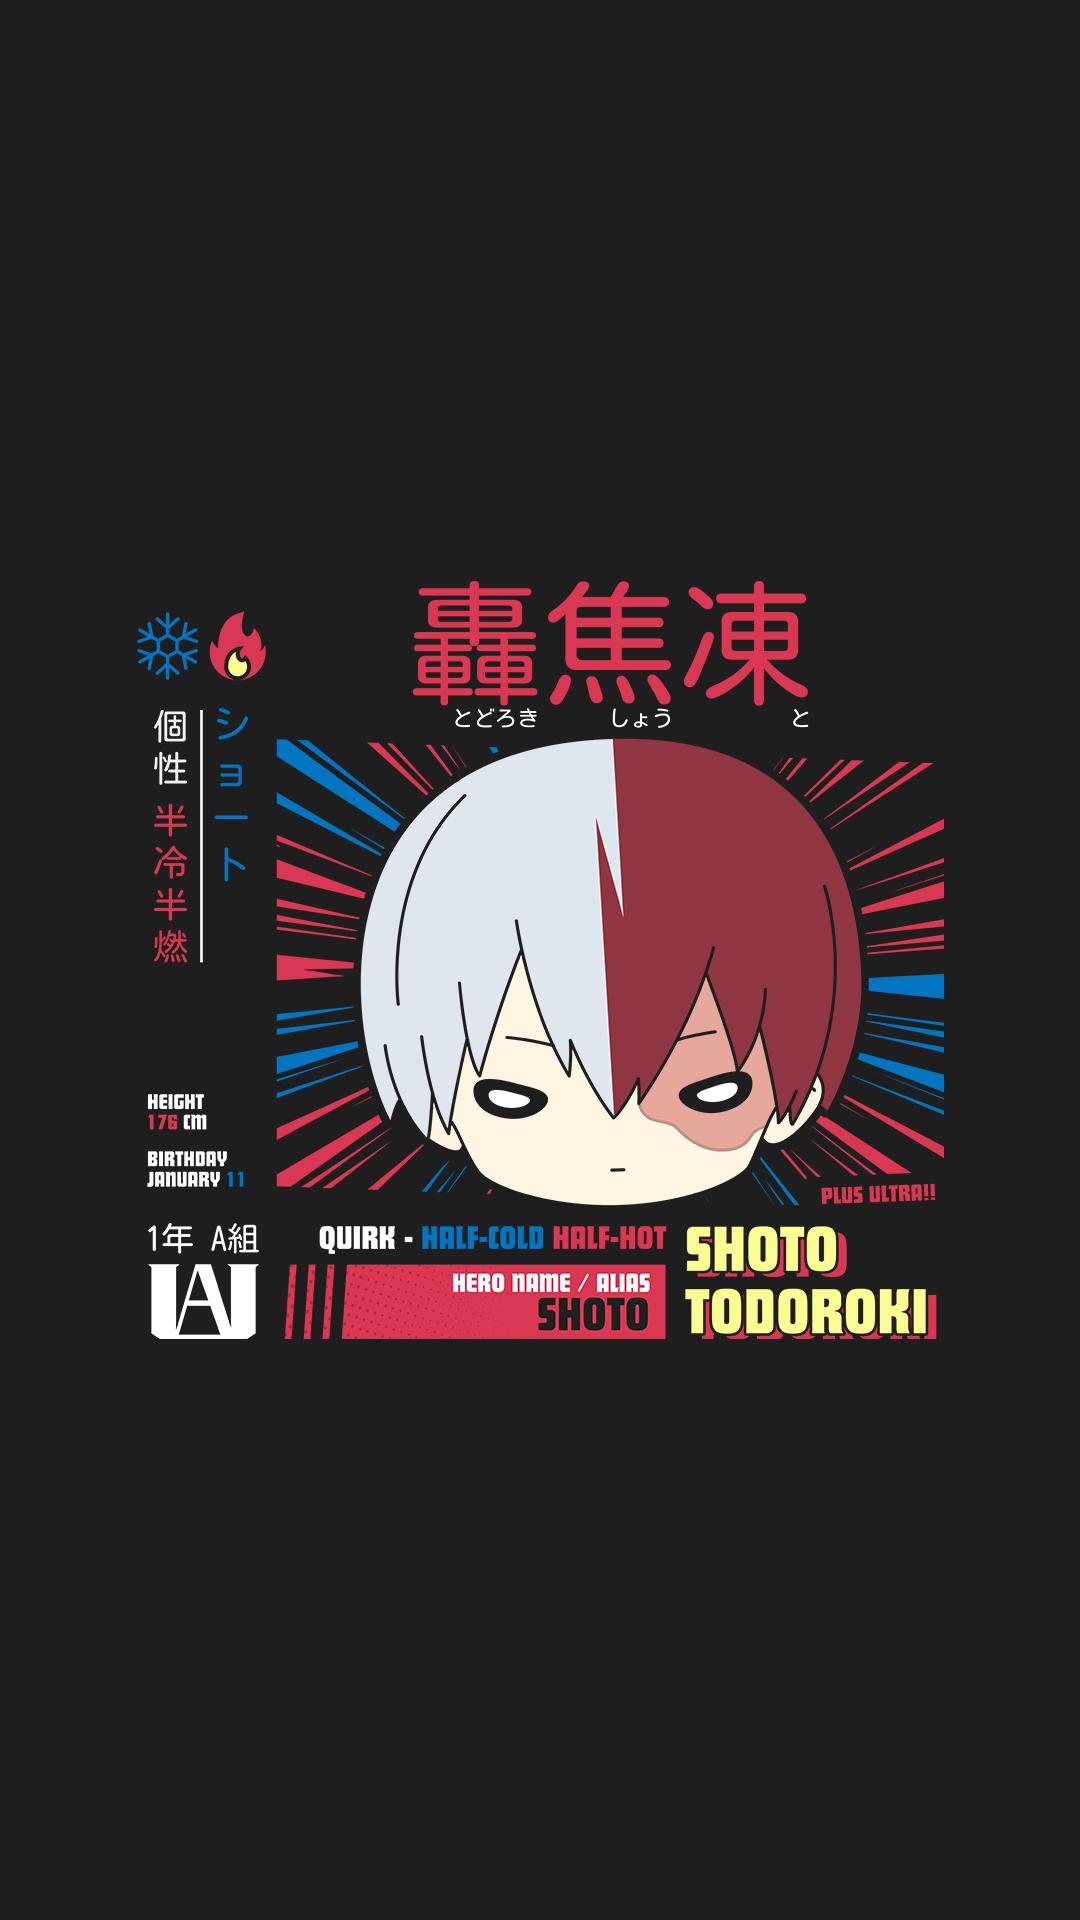 Shoto Todoroki Wallpaper Shoto Hero Wallpaper Anime Wallpaper Chibi Wallpaper